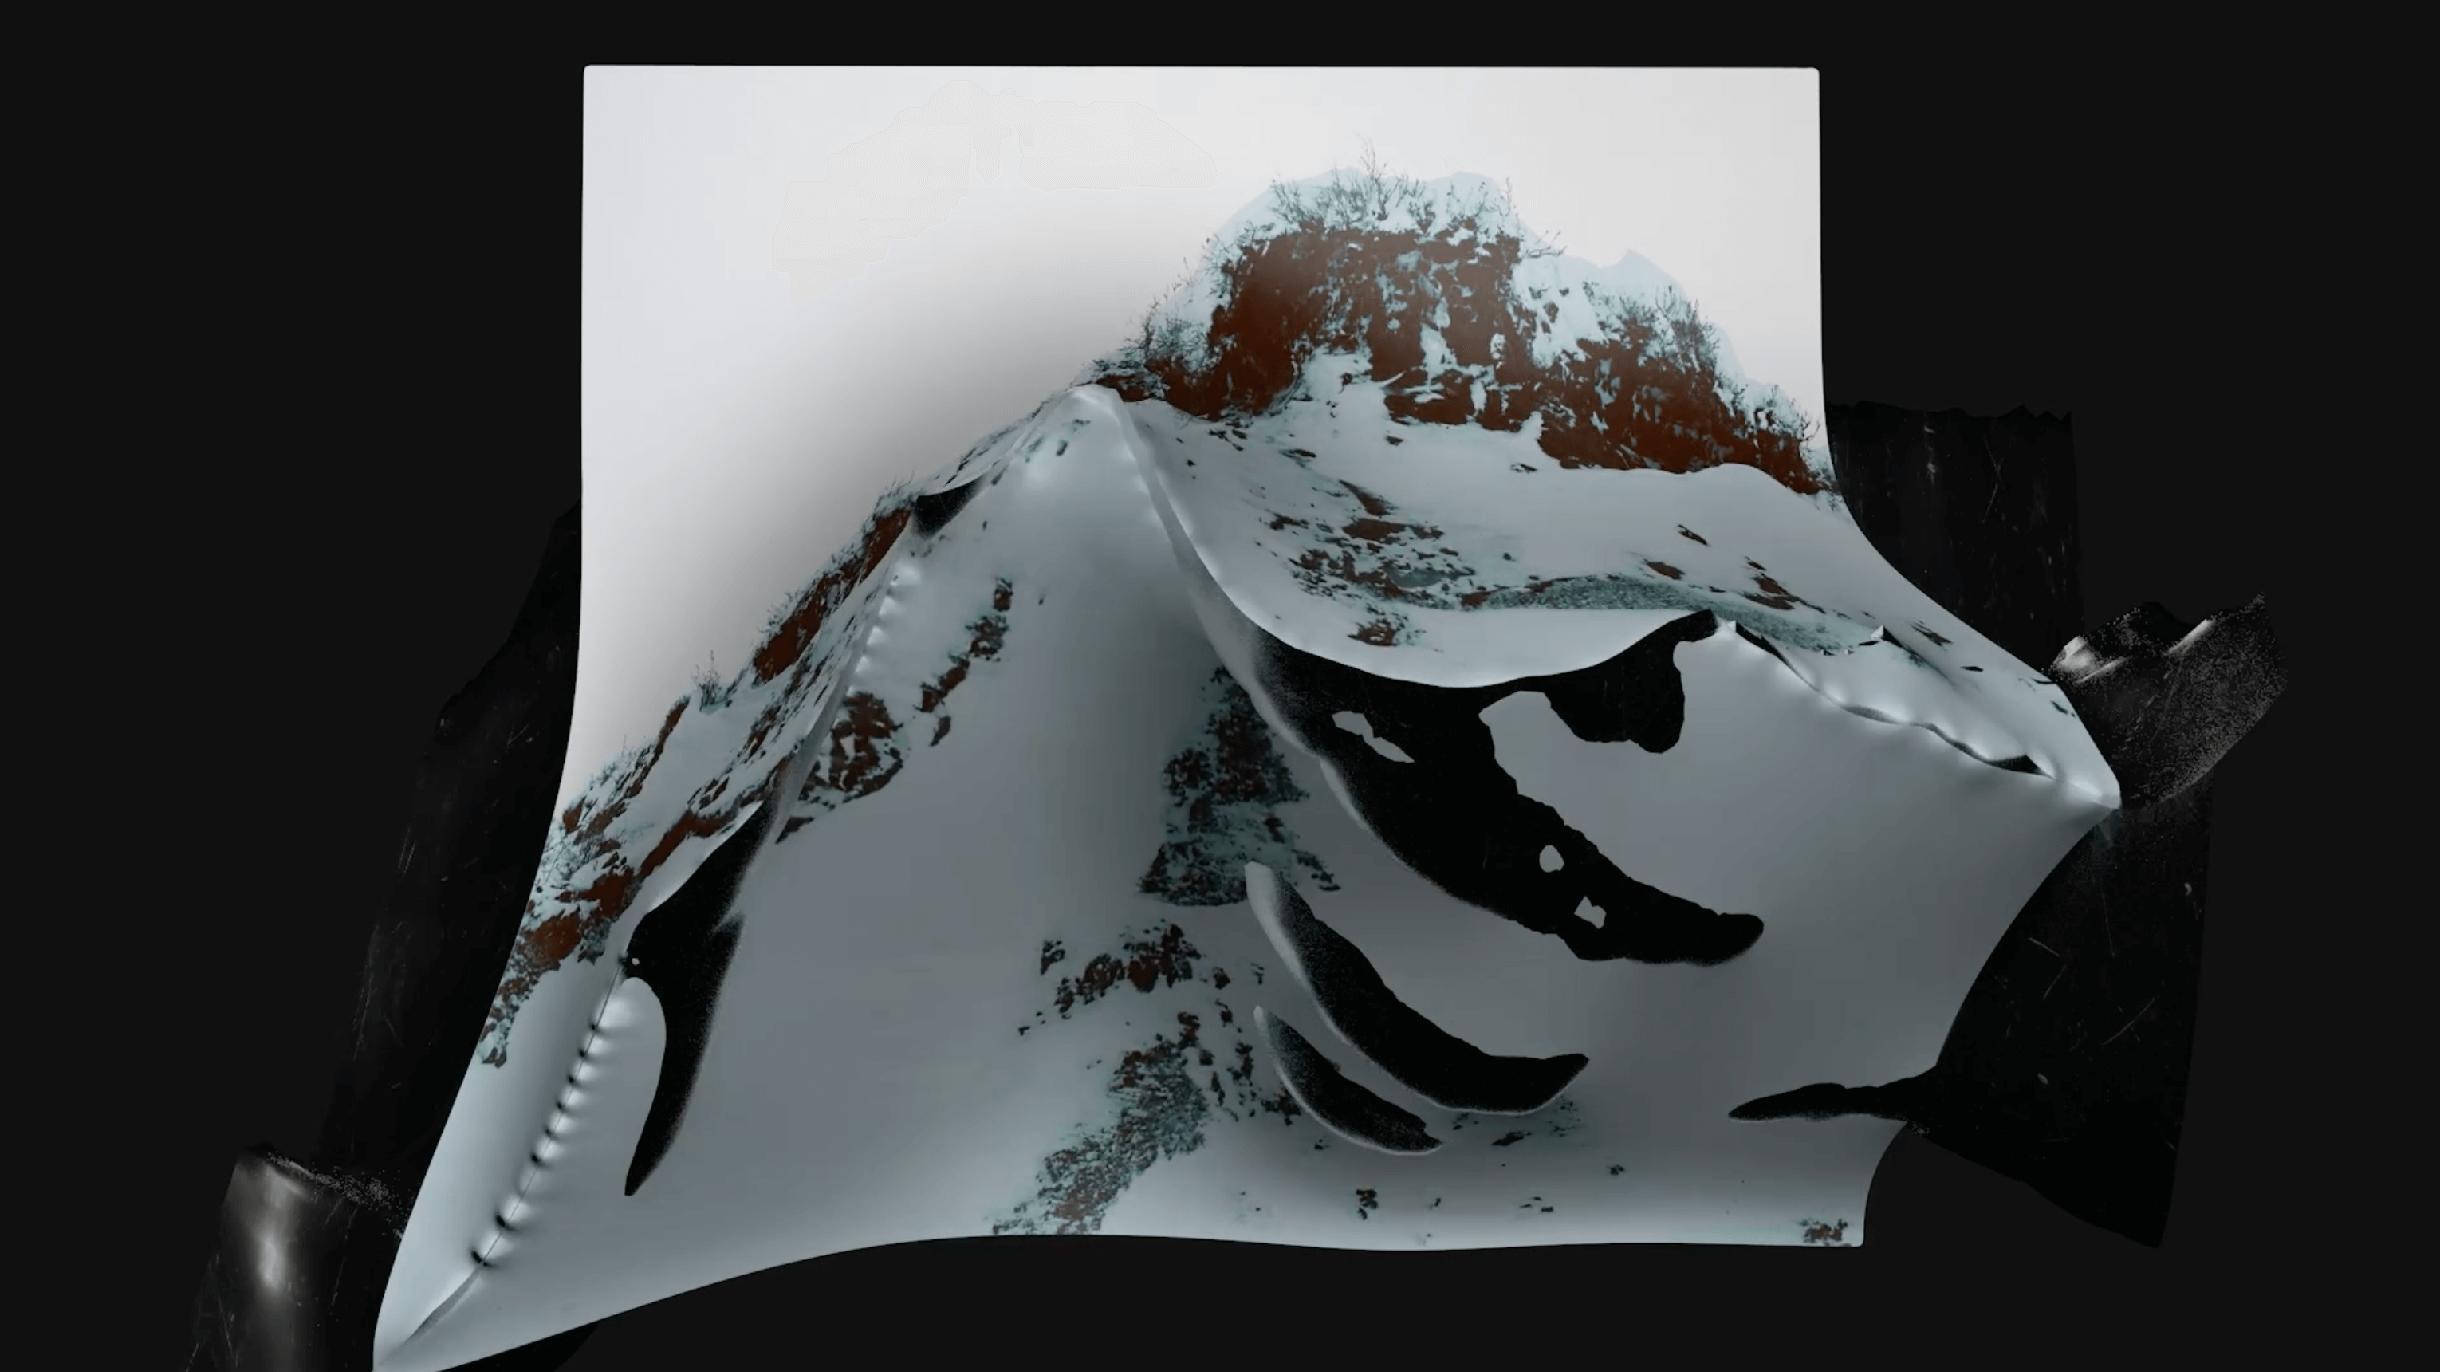 A CGI rendering of arctic terrain